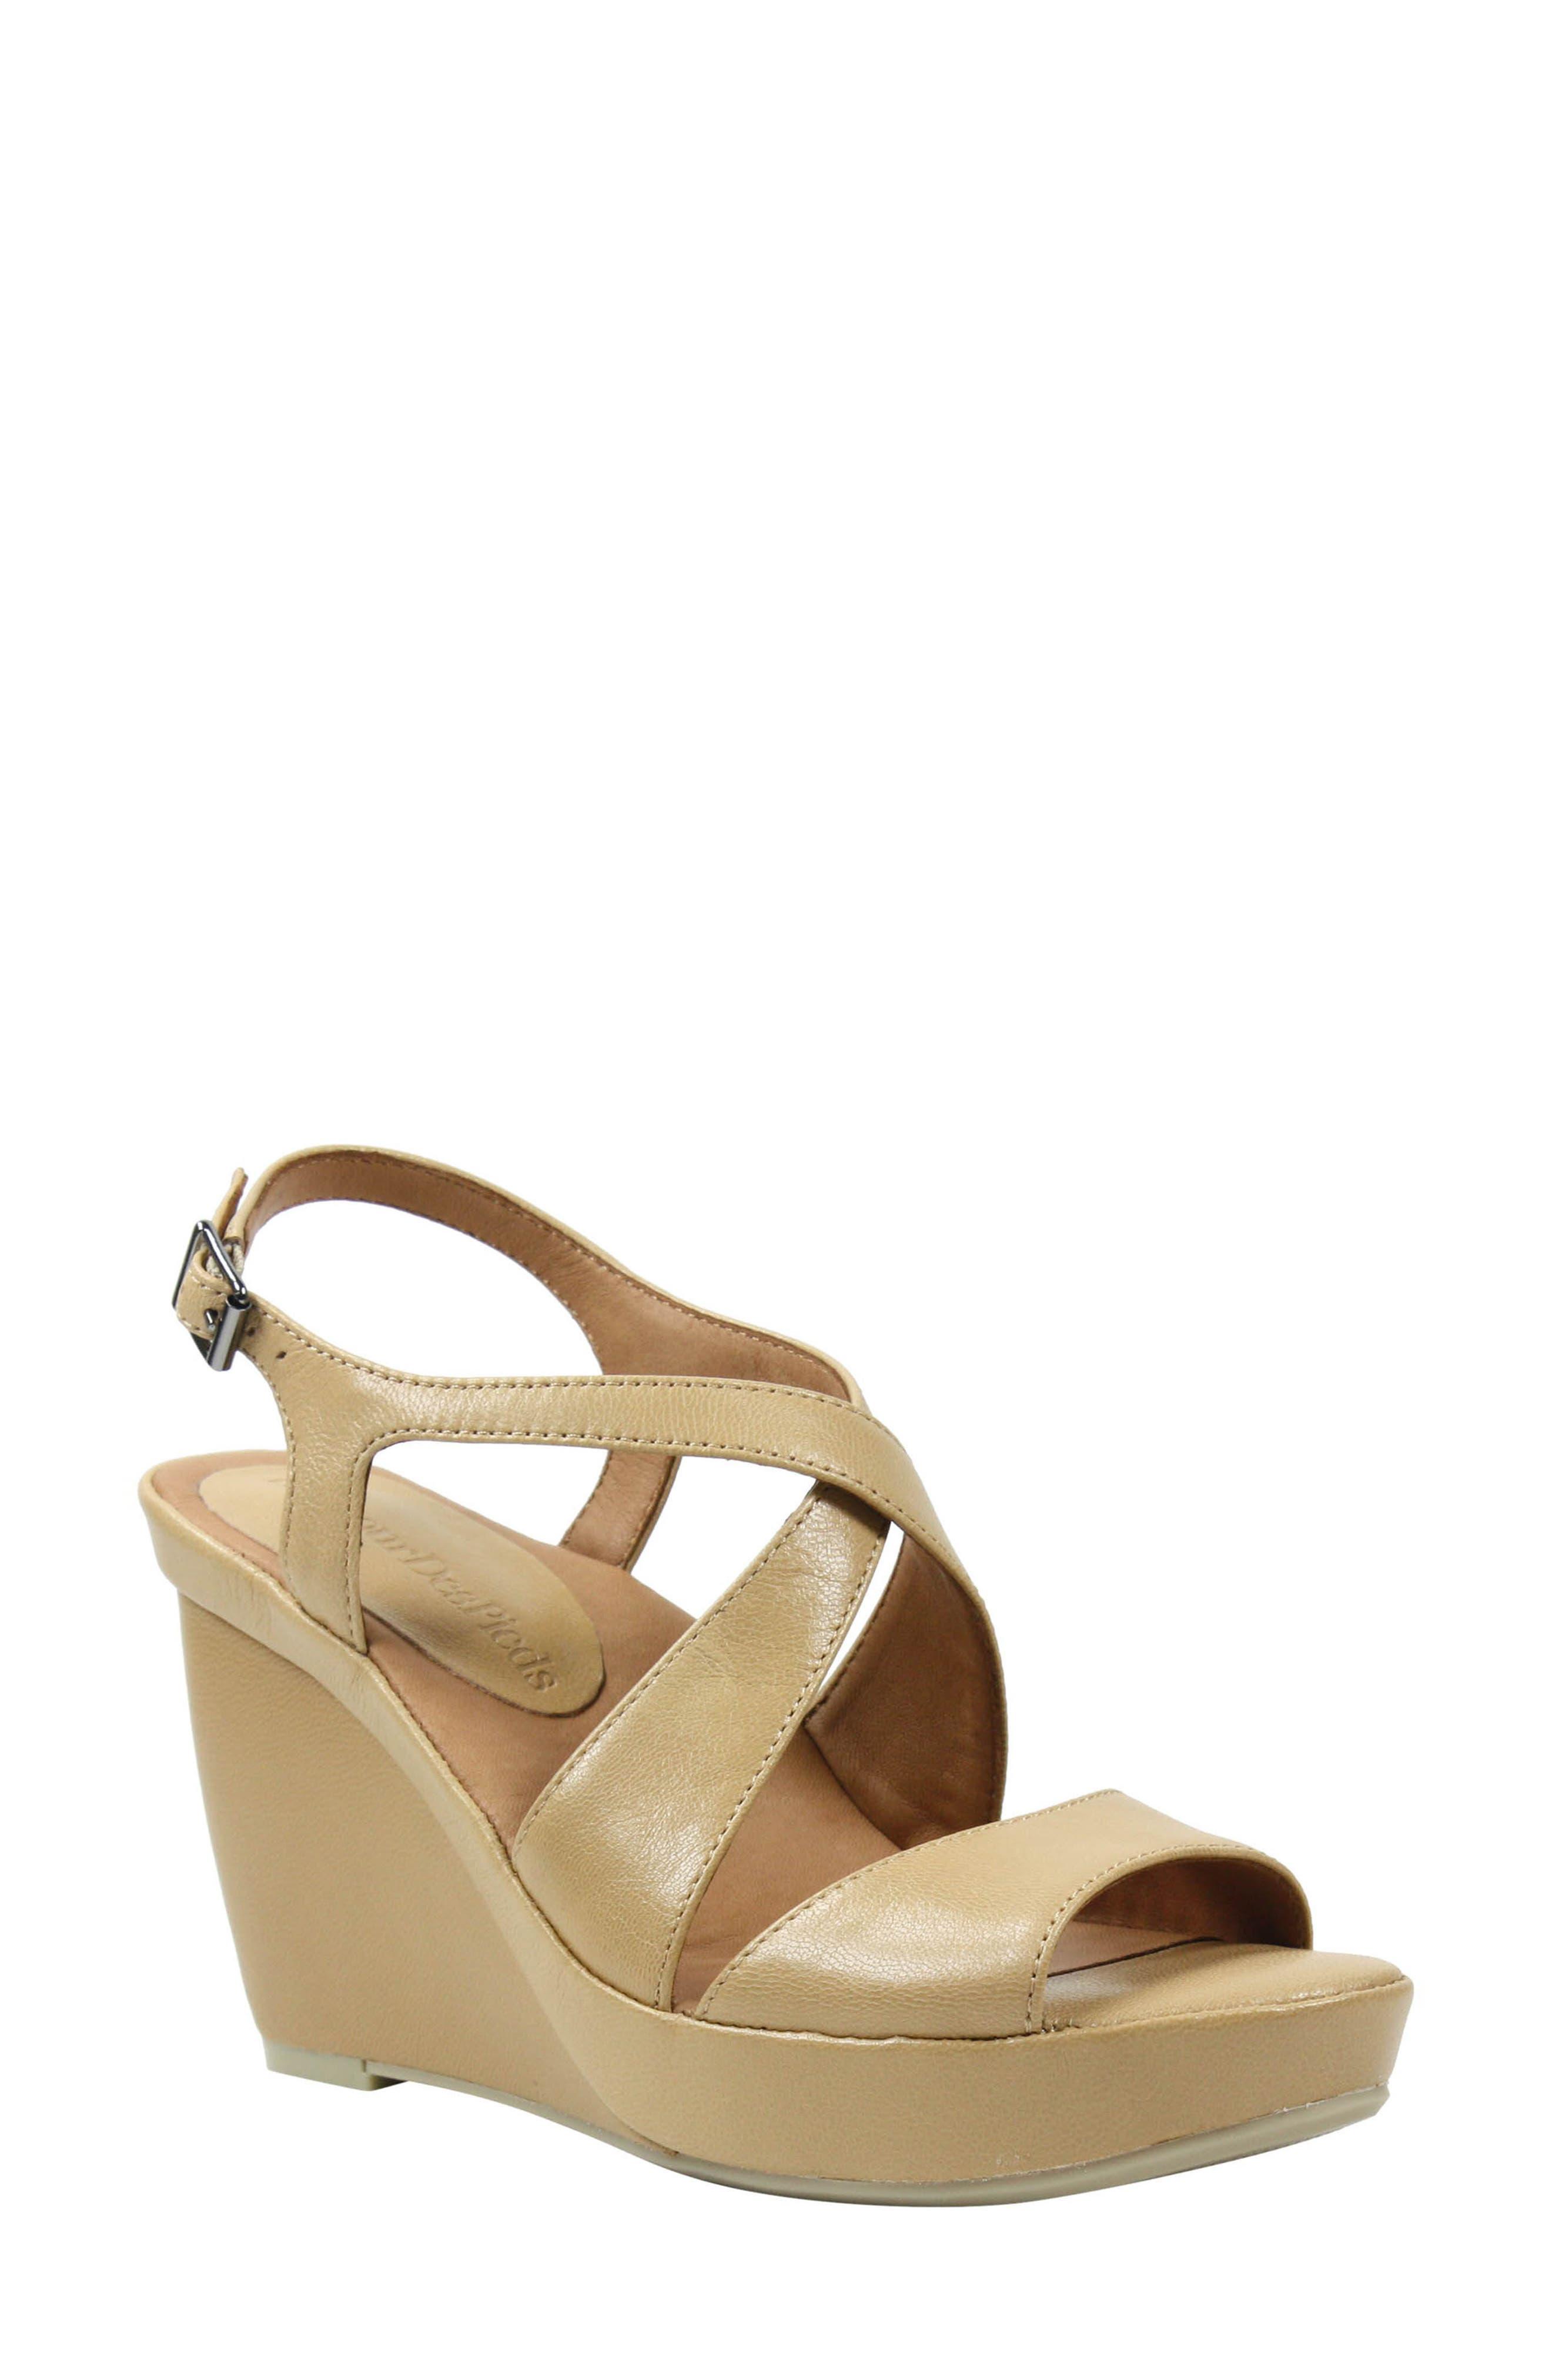 L'Amour Des Pieds Ilanna Leather Wedge Sandals UpG0N